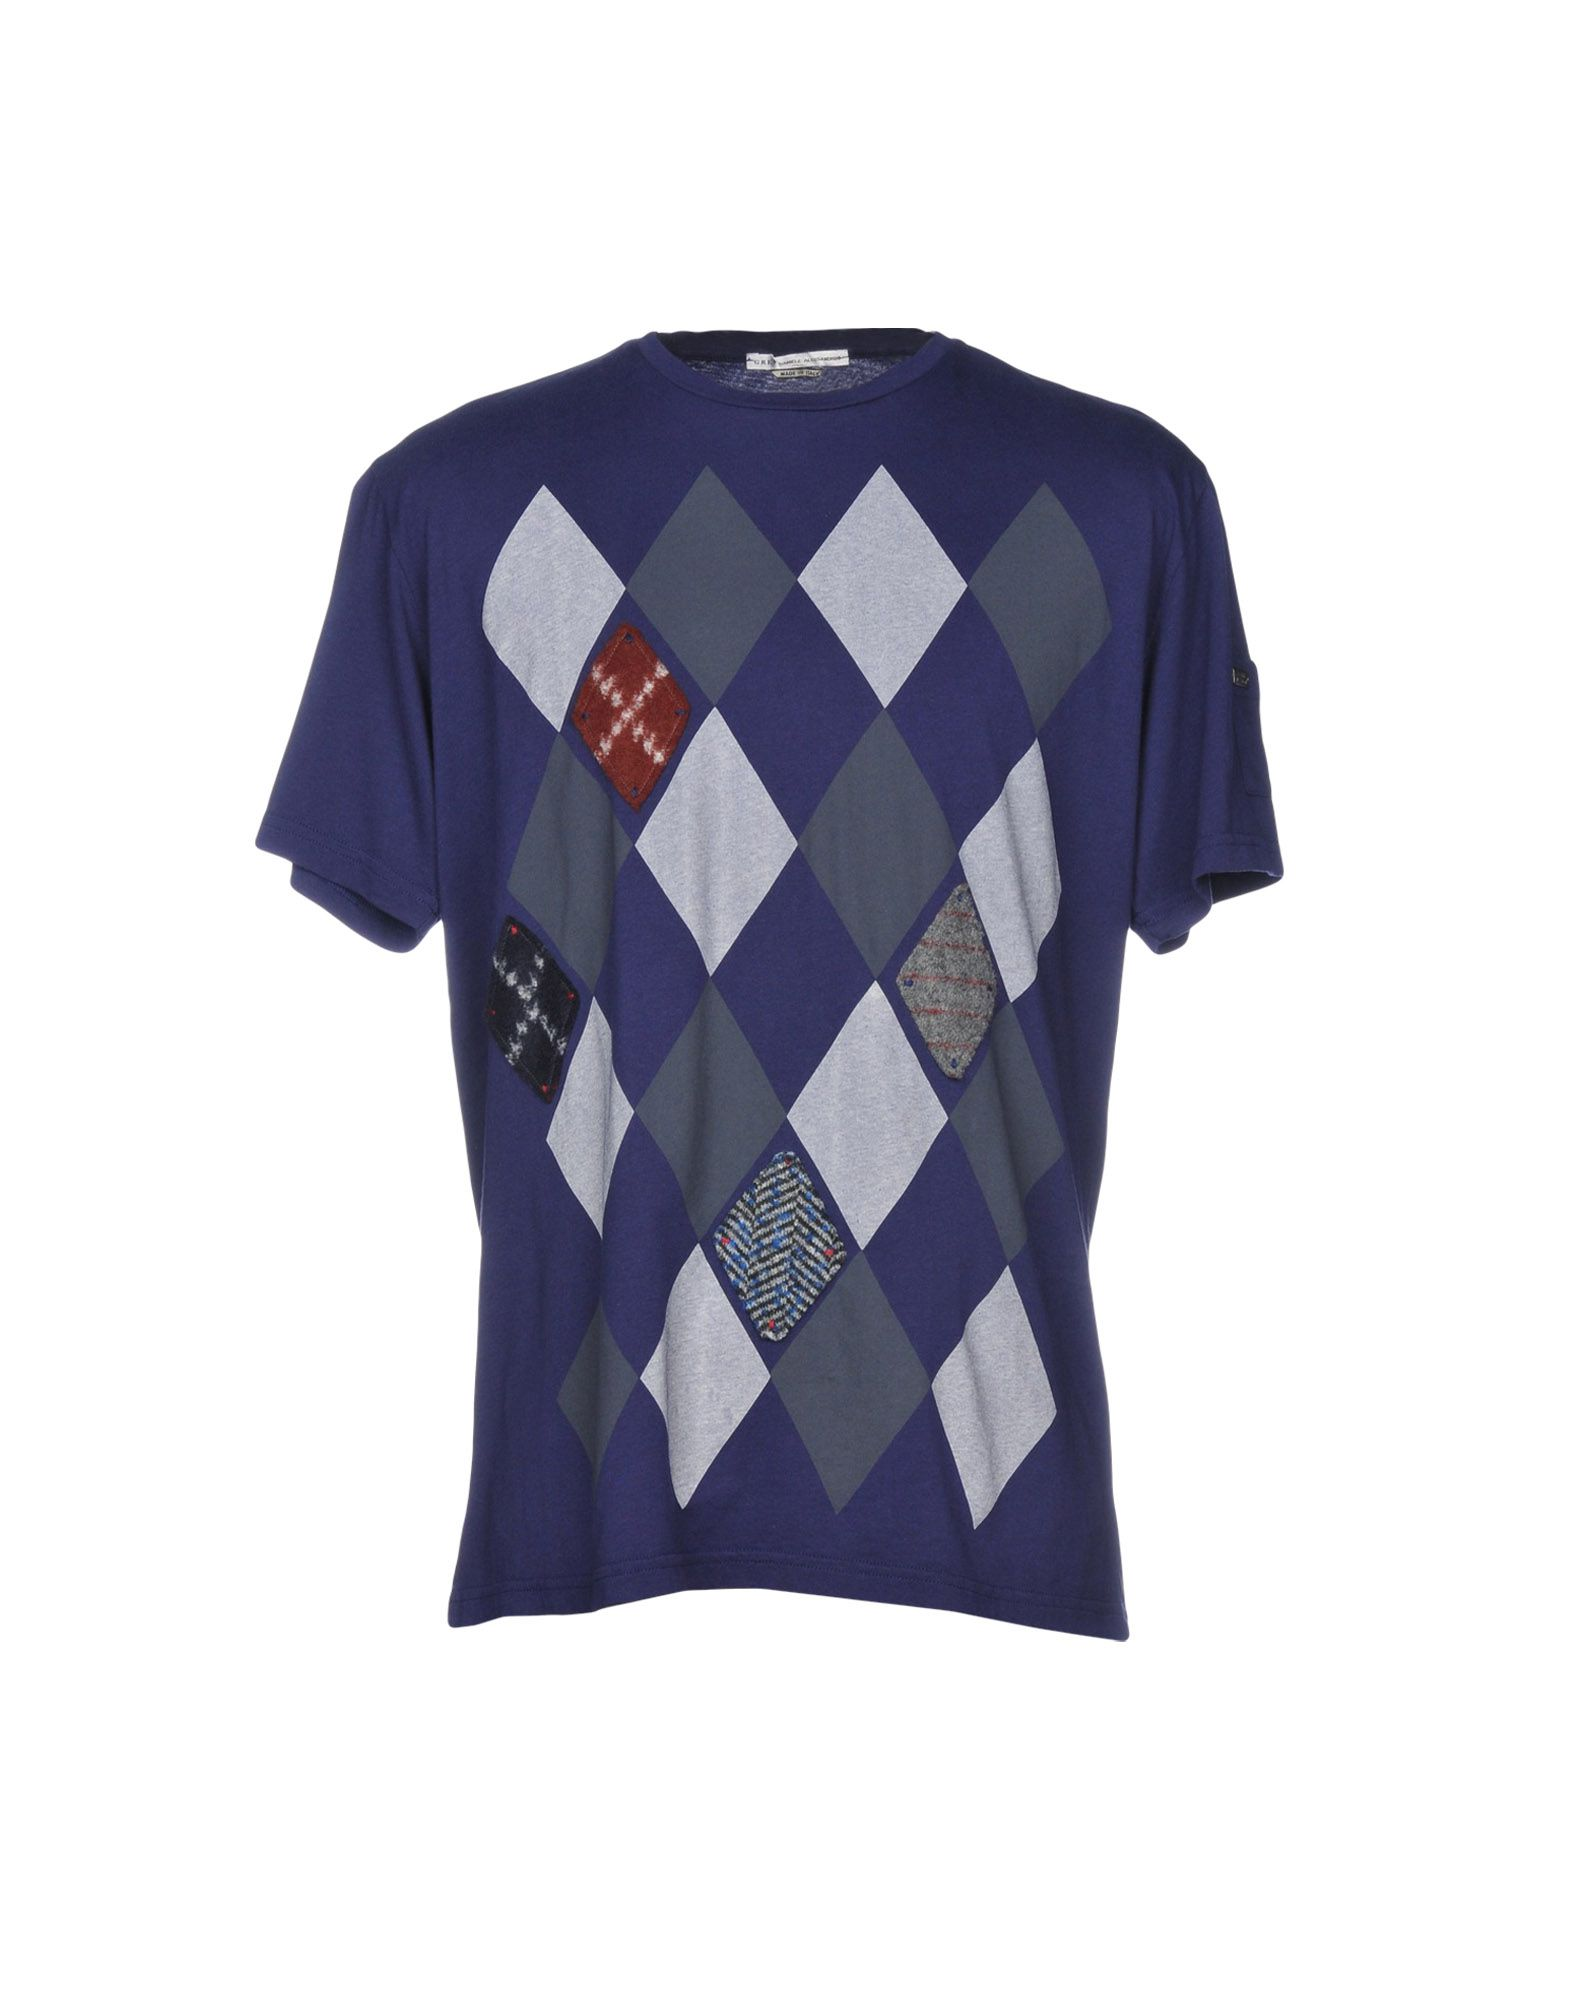 T-Shirt Daniele Alessandrini Homme Uomo Uomo Homme - 12189038MC eedbed